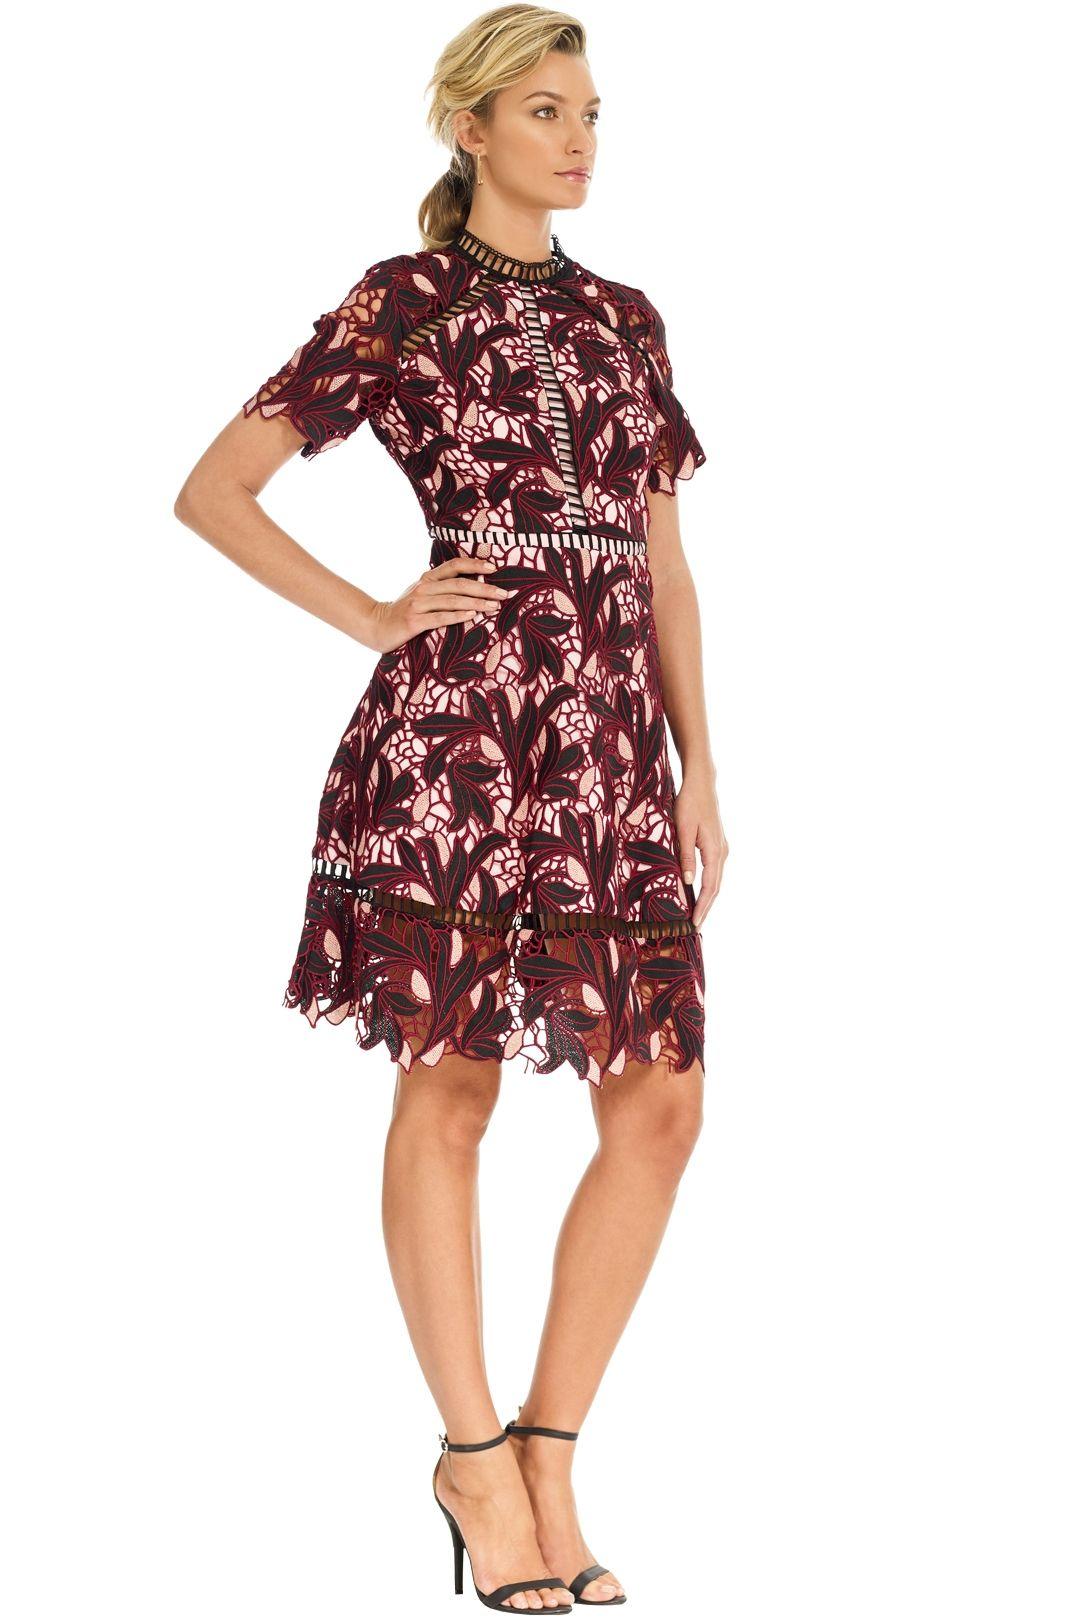 Elliatt - Montague Dress - Merlot - Side